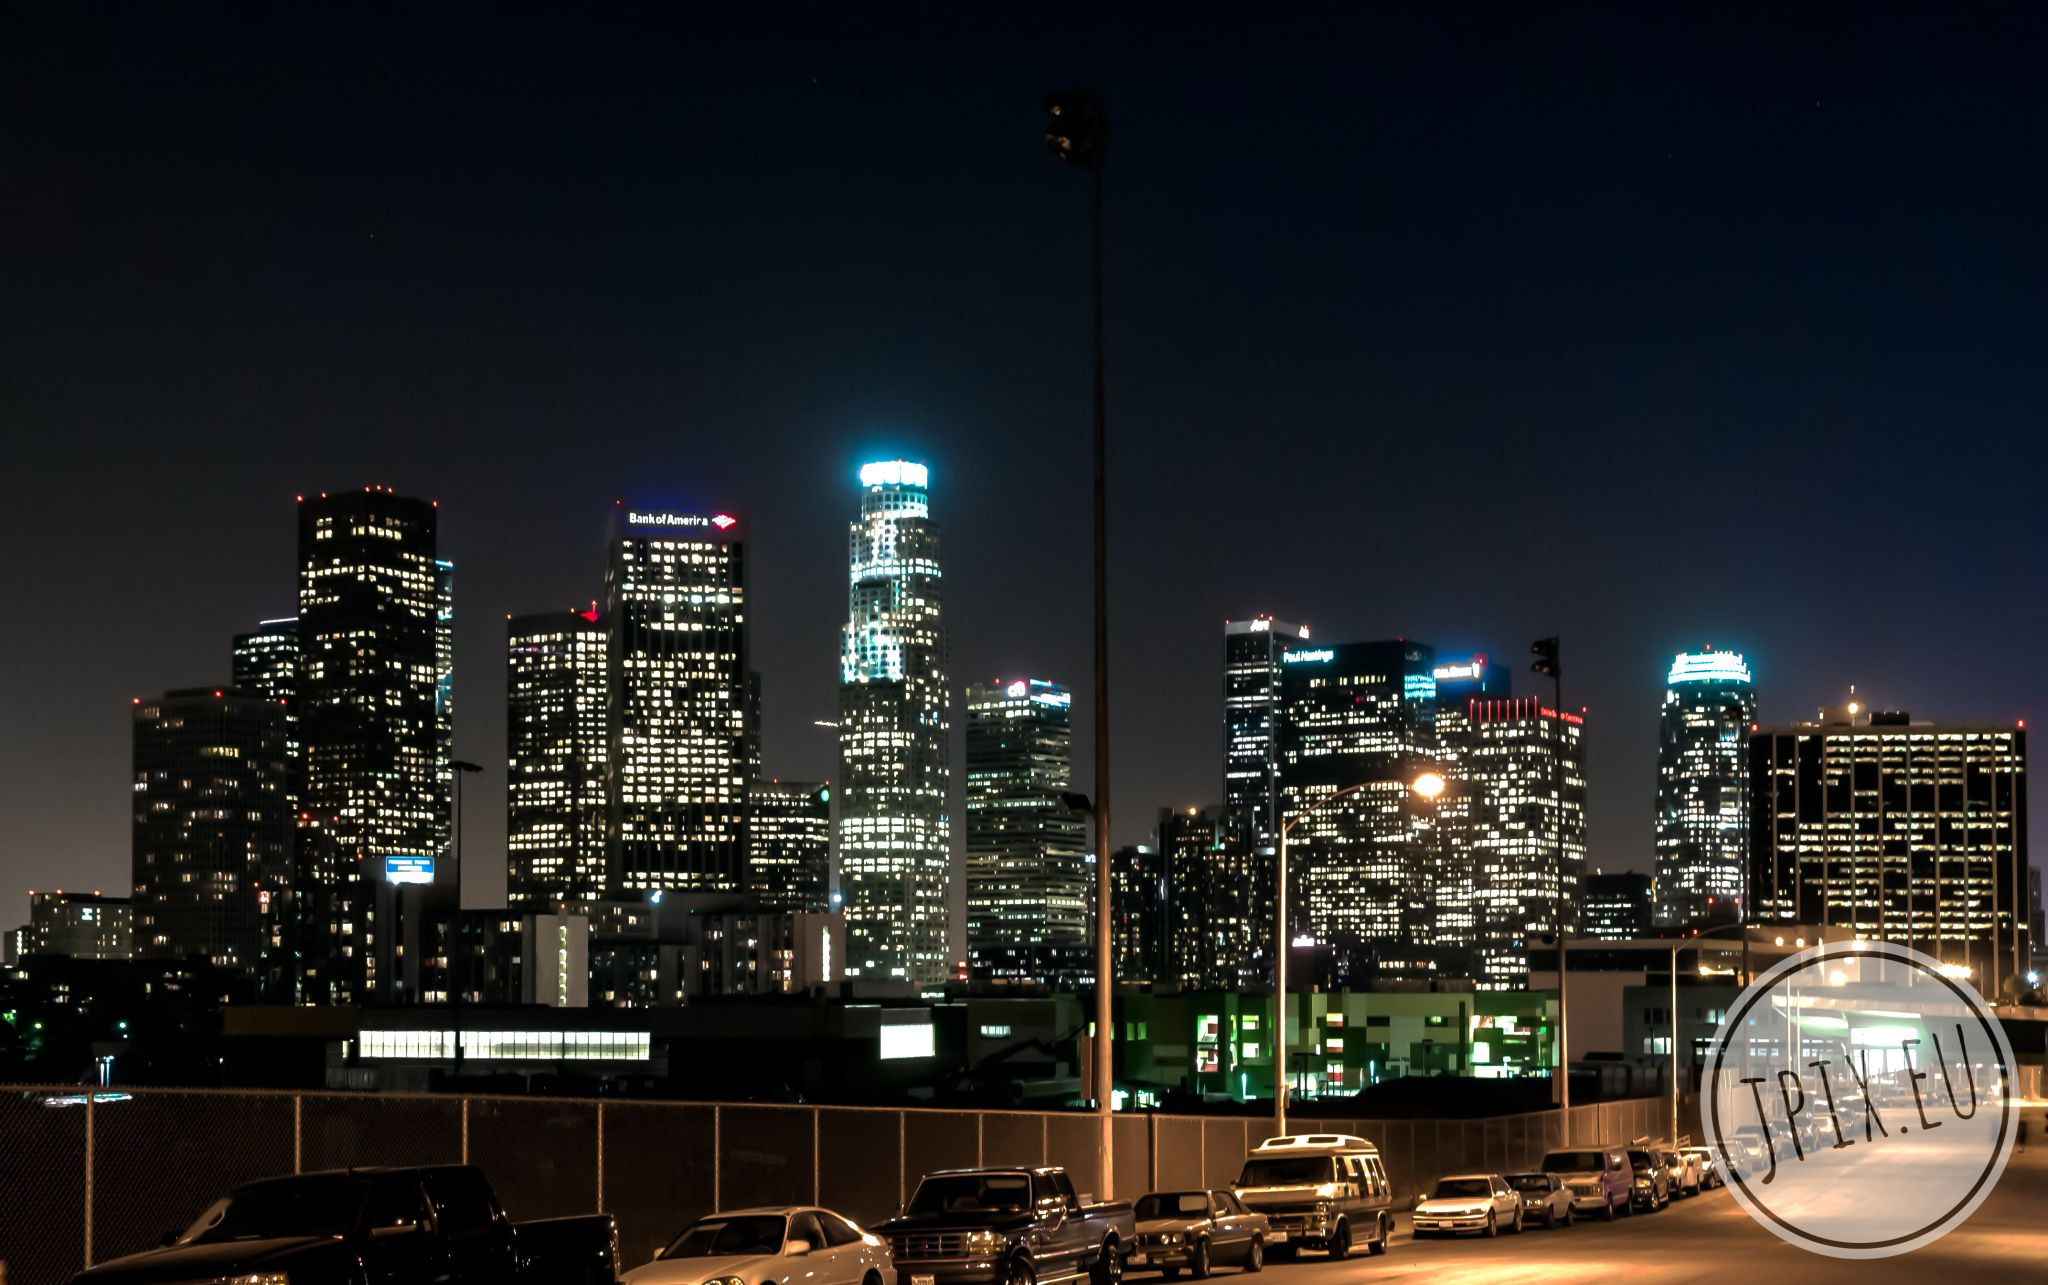 Skyline of Downtown Los Angeles, USA